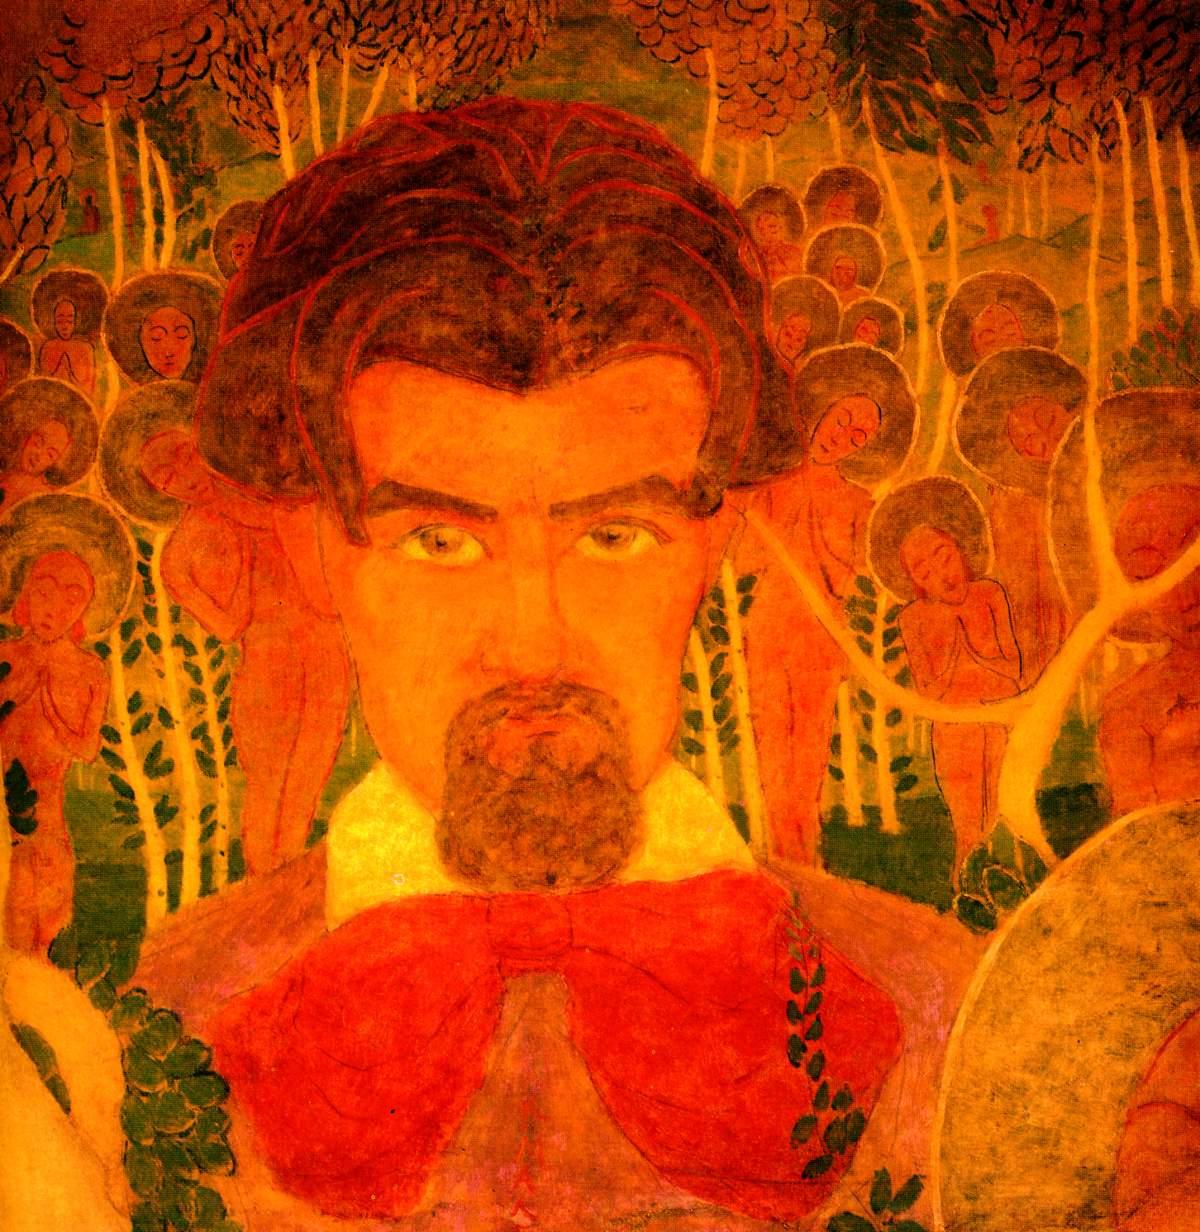 Self-Portrait, 1907 - Kazimir Malevich - WikiArt.org